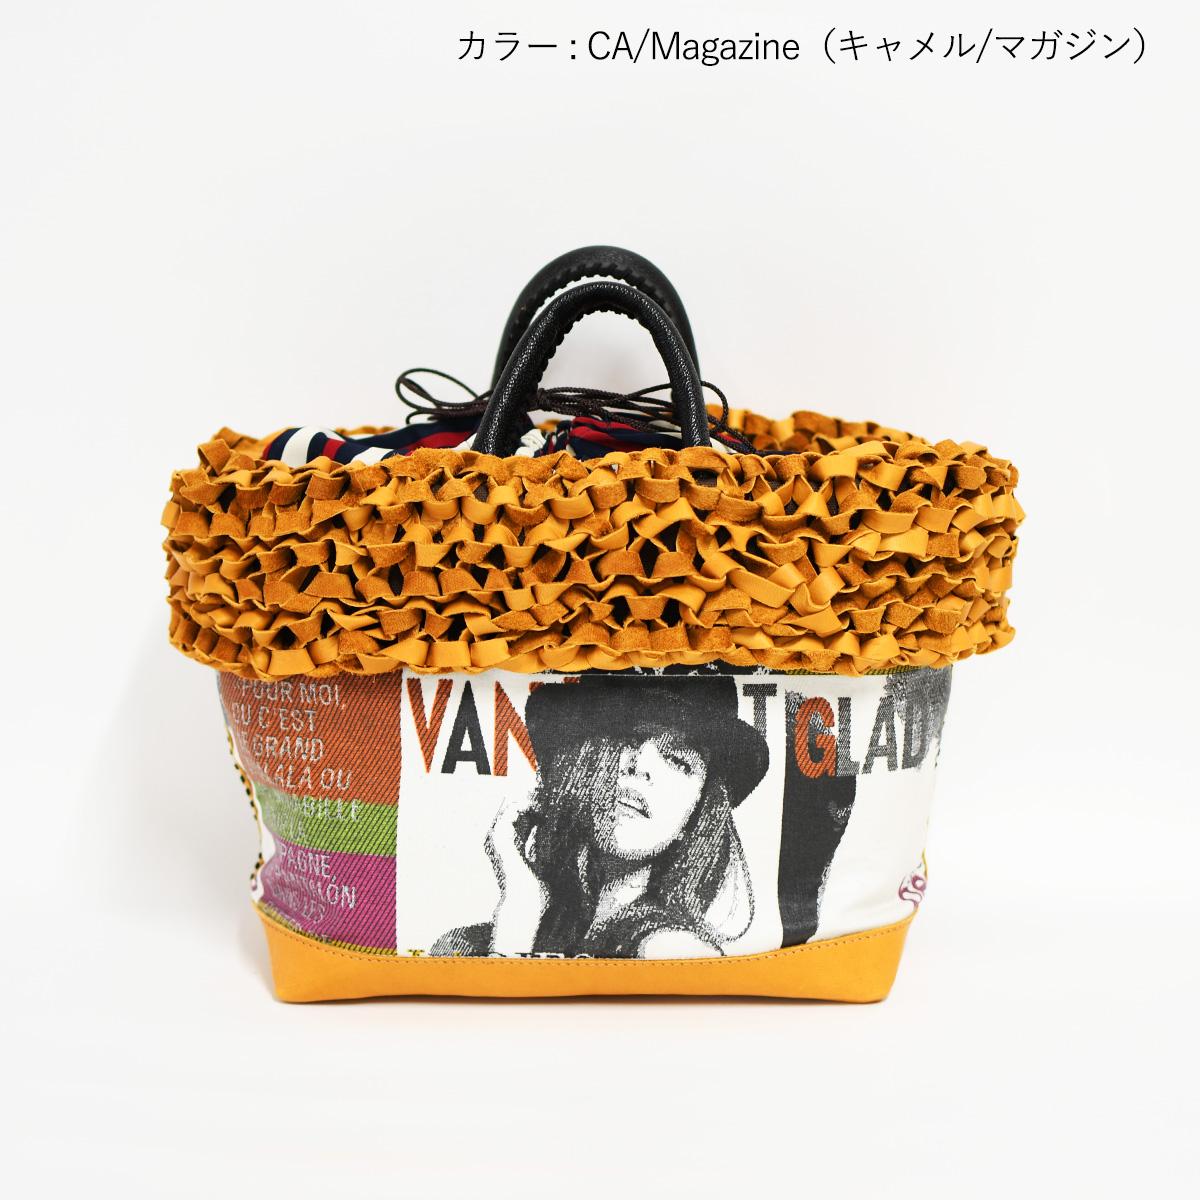 CA/Magazine